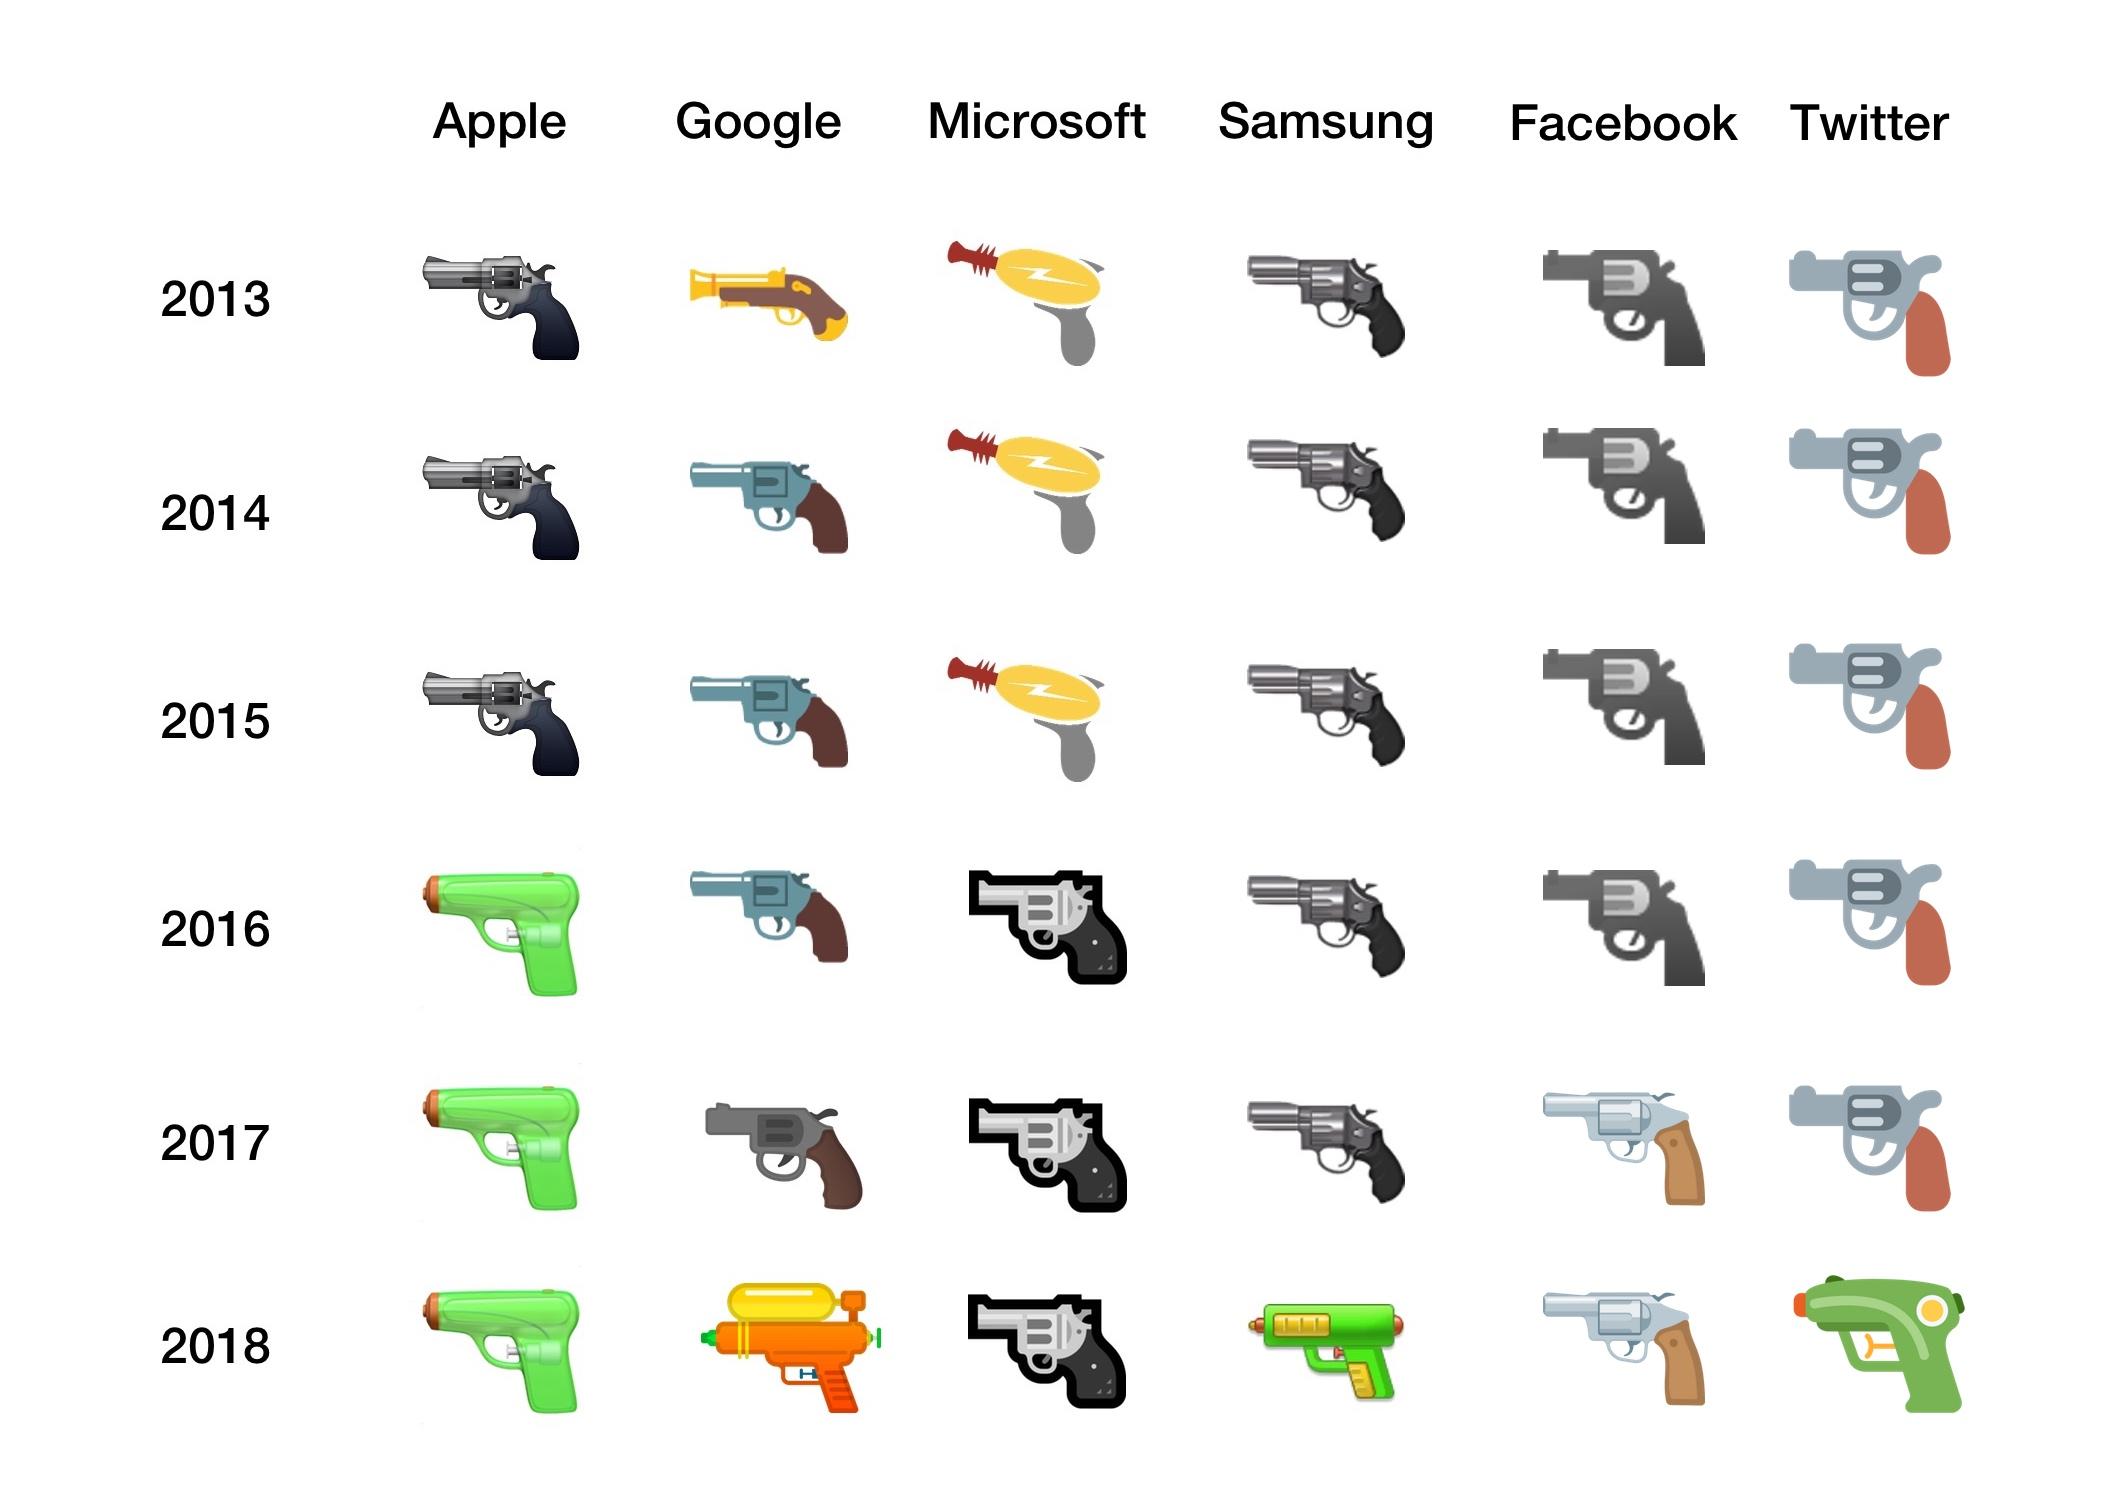 pistol-emoji-comparison-image-emojipedia-2018